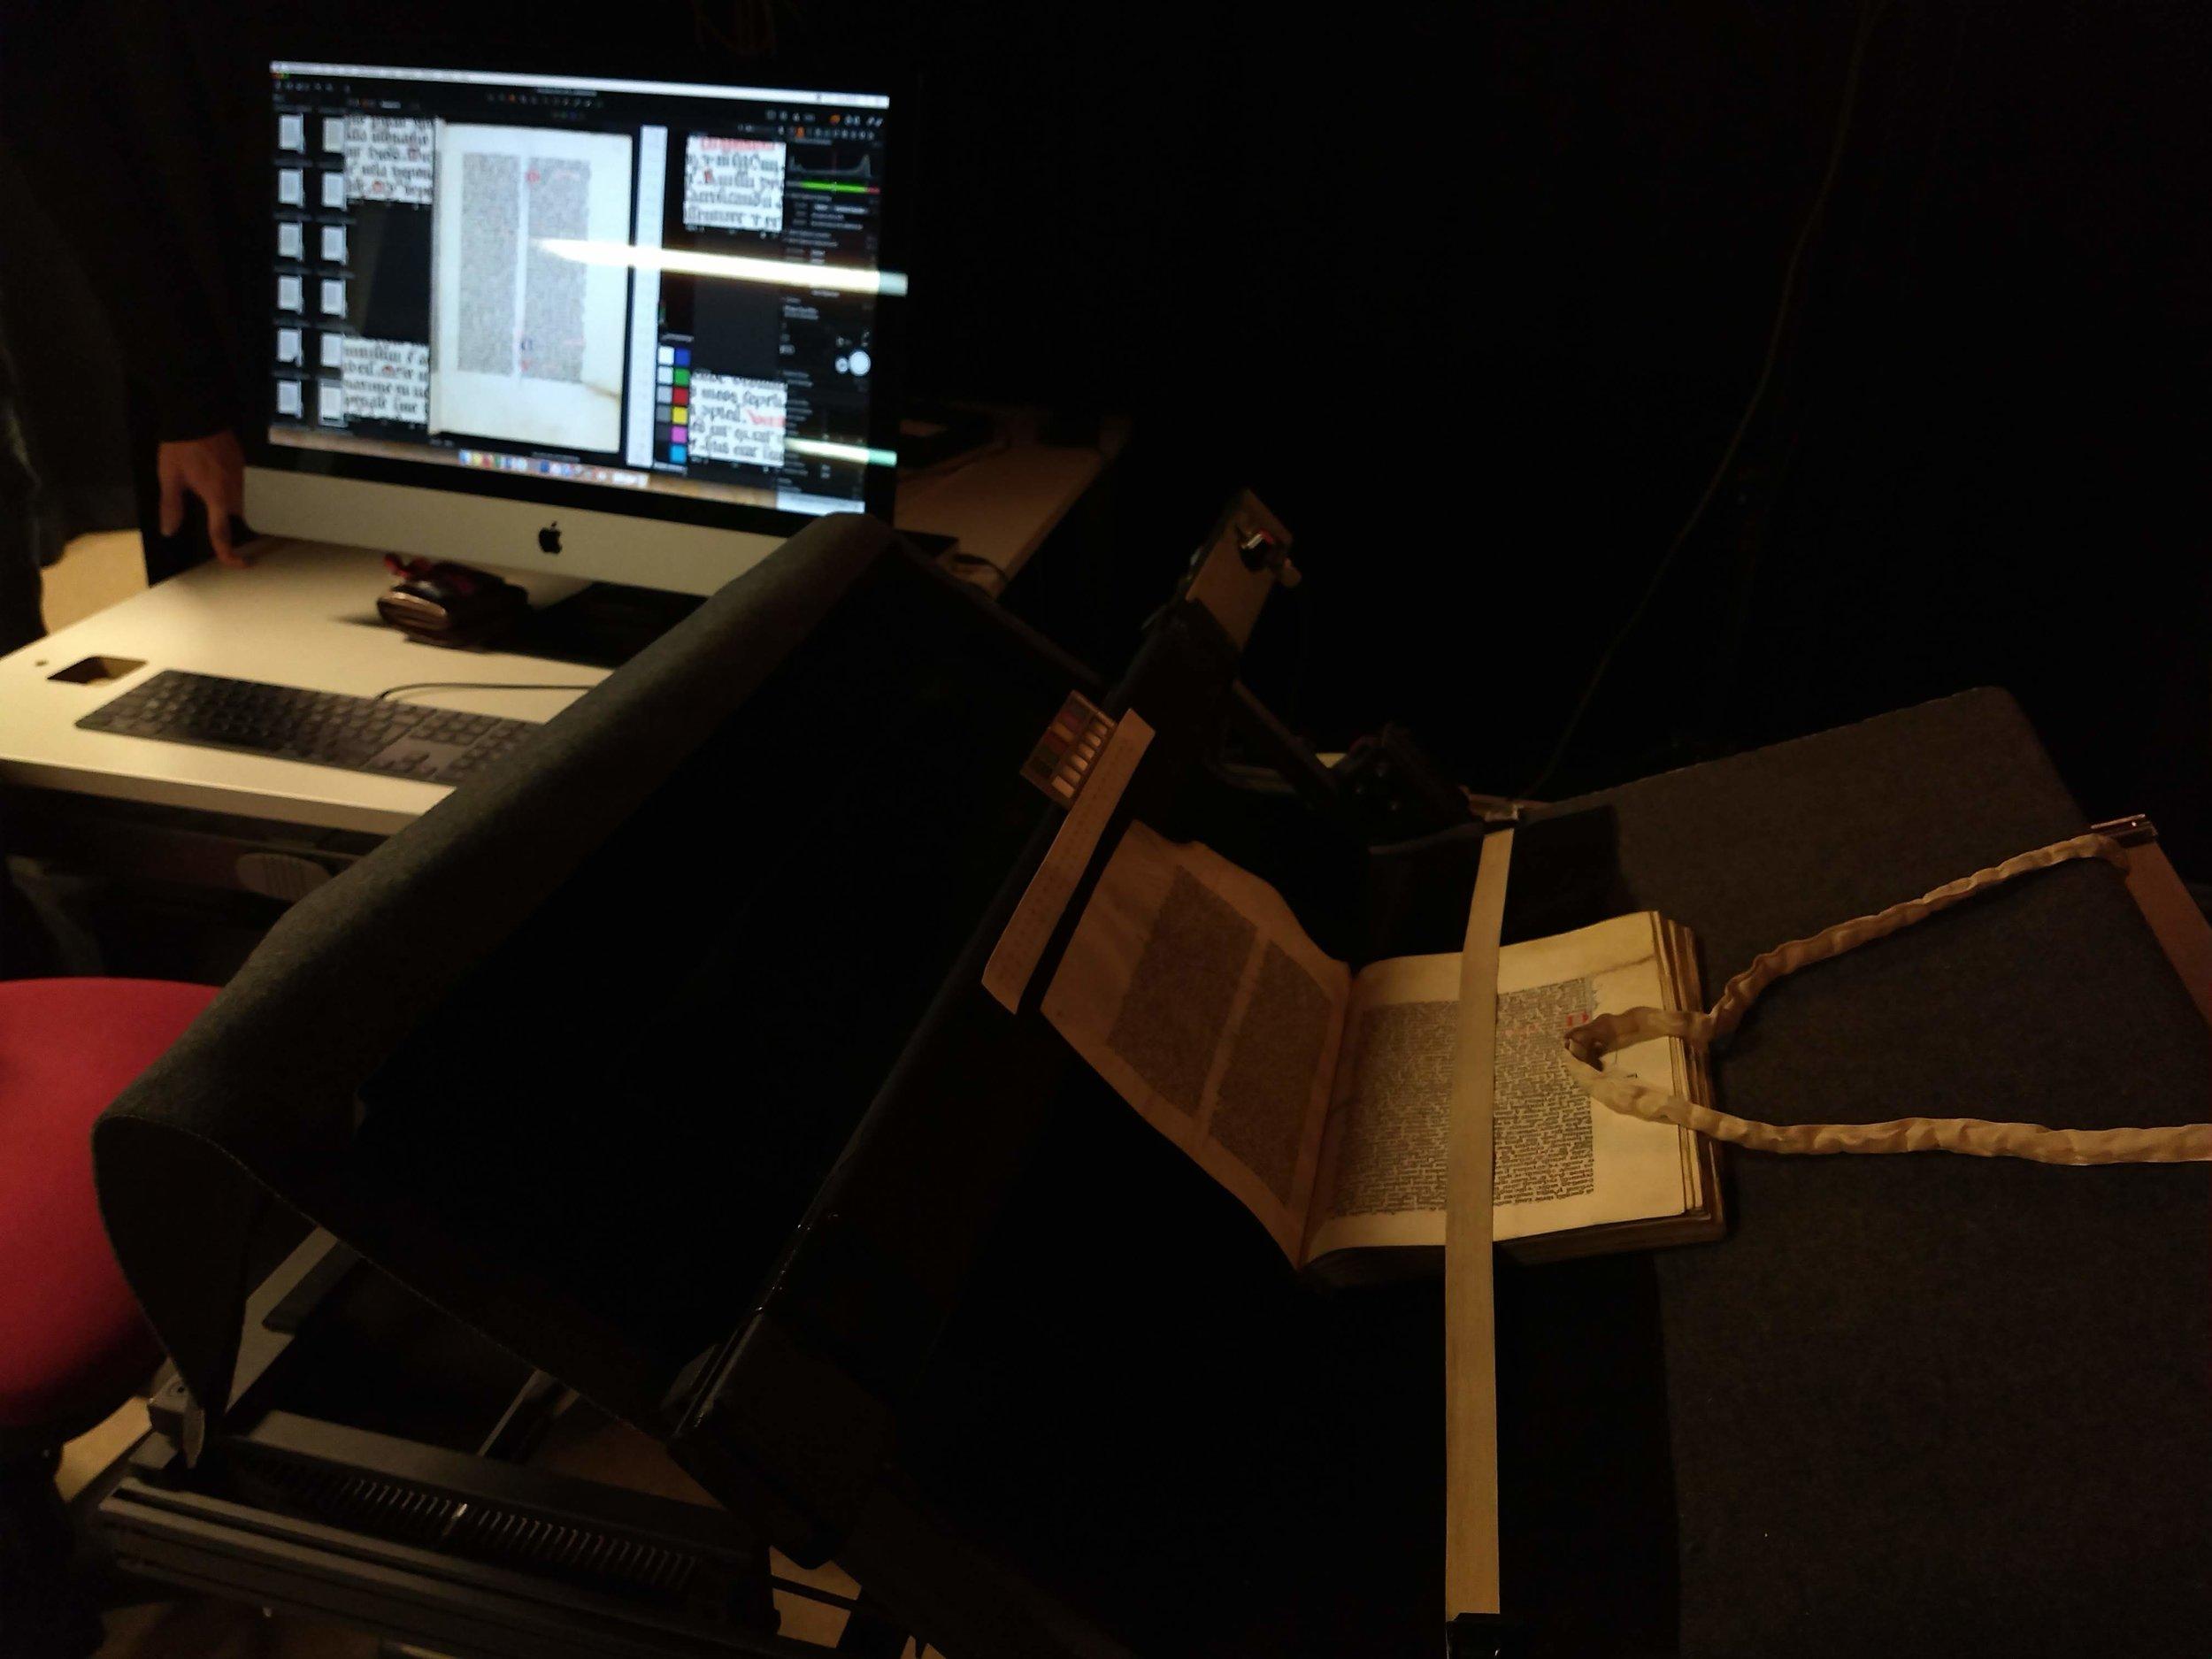 Imaging Service set up at Weston Library